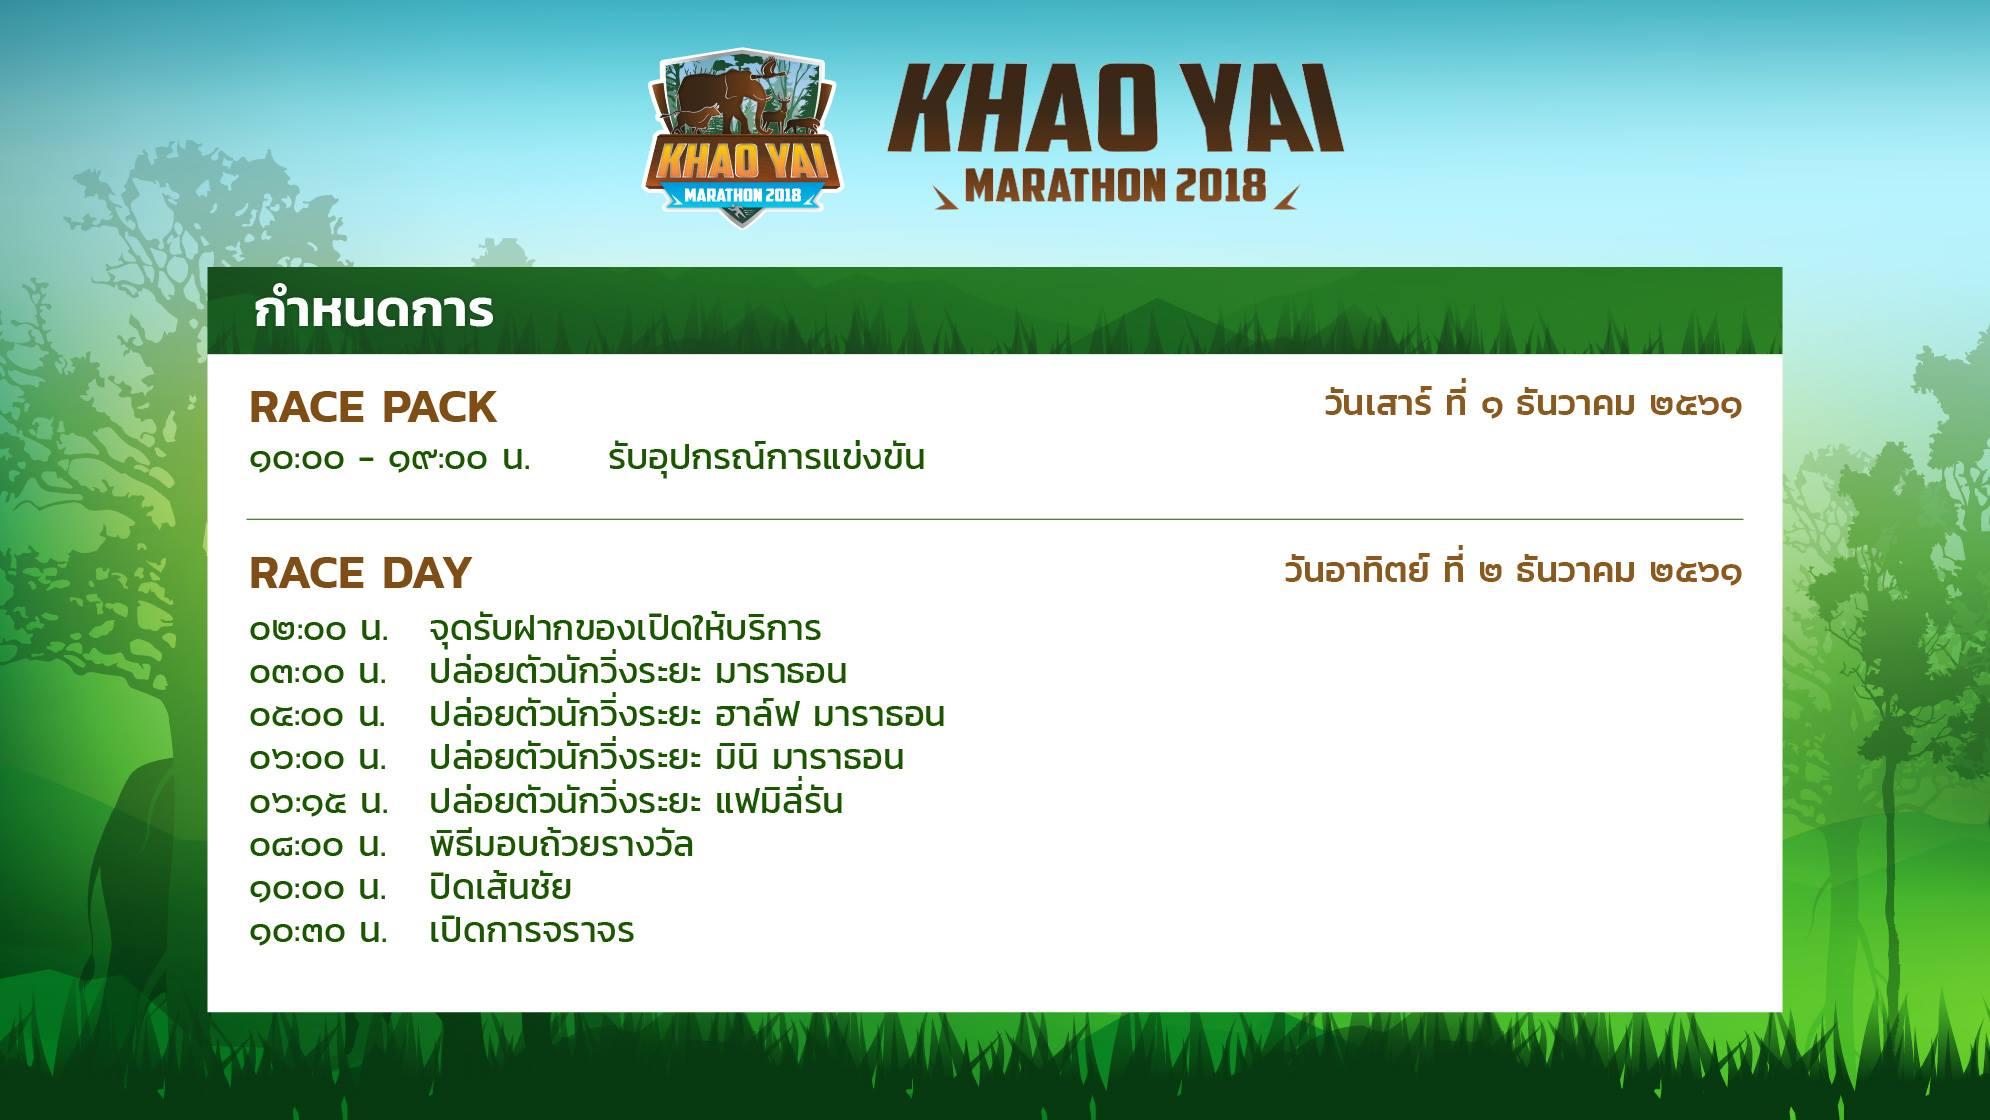 Khao Yai Marathon 2018 วิ่งชิงถ้วยพระราชทาน 3 พระองค์